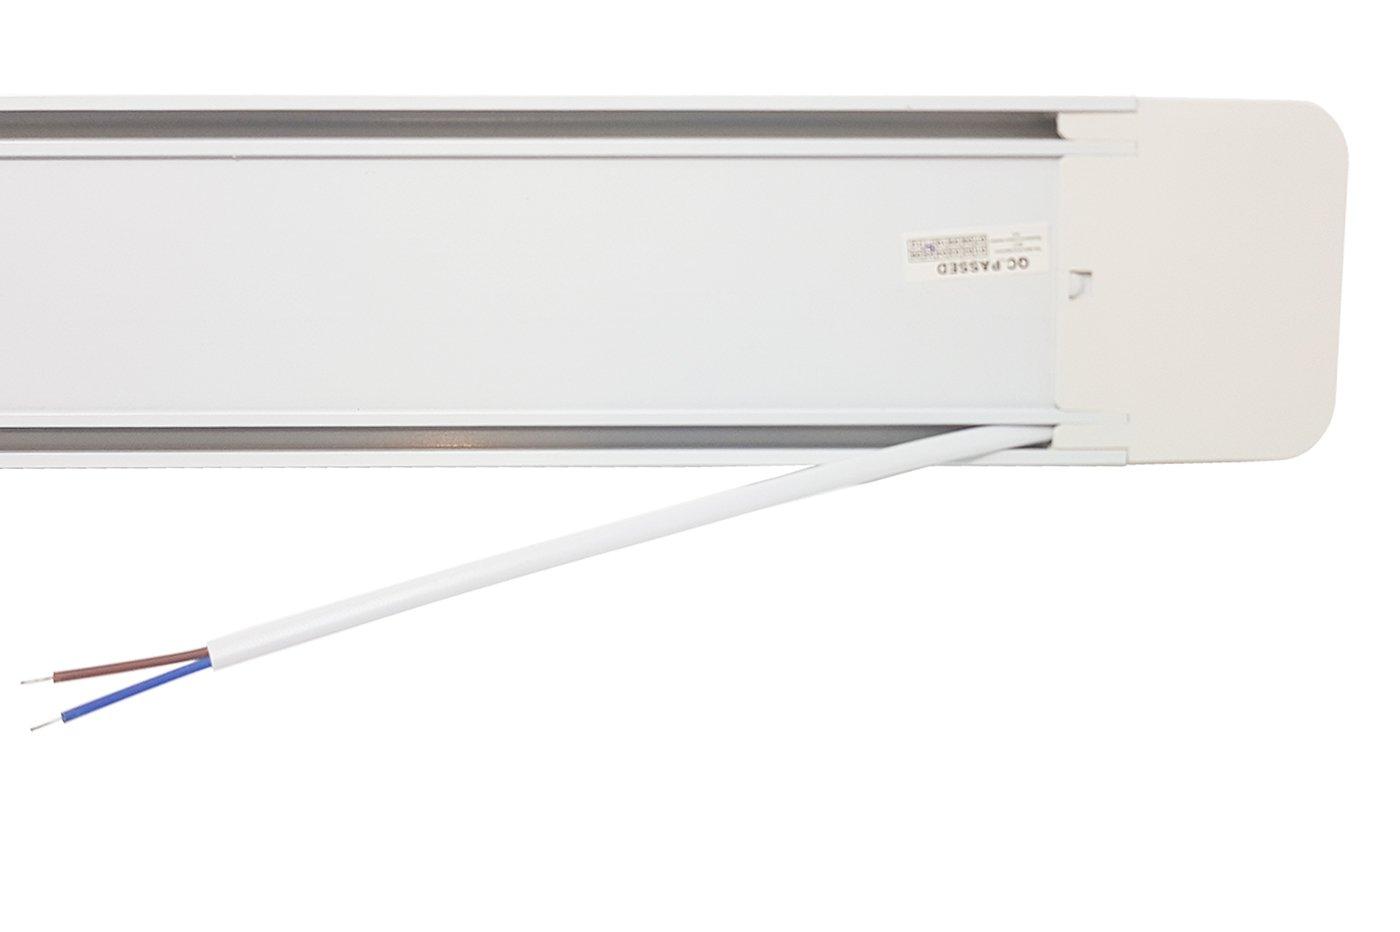 Plafoniere Slim Led Calda : Plafoniera led w watt luce calda cm slim smd parete soffitto